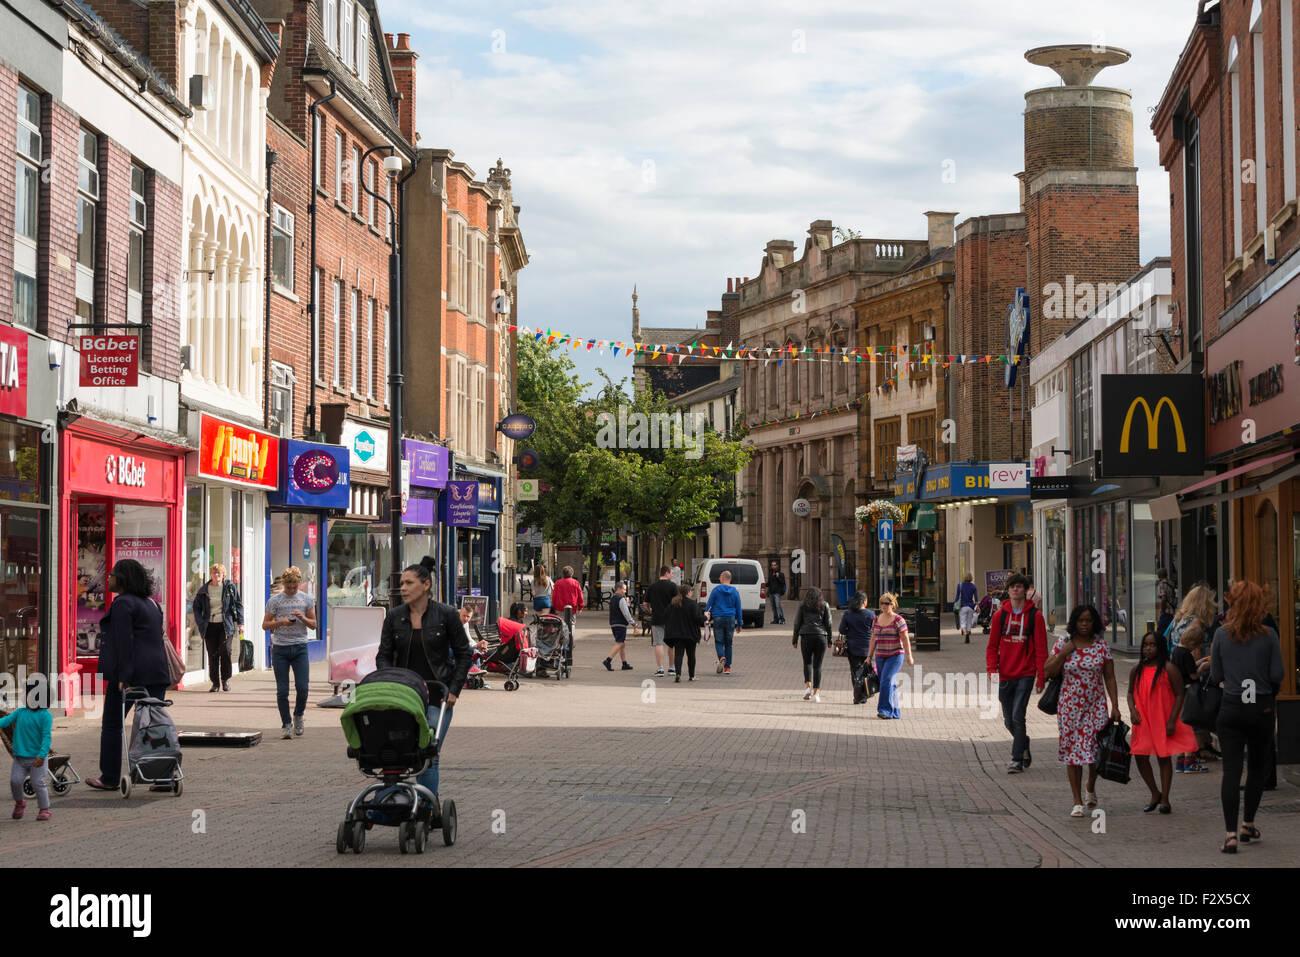 Pedestrianised High Street, Kettering, Northamptonshire, England, United Kingdom - Stock Image